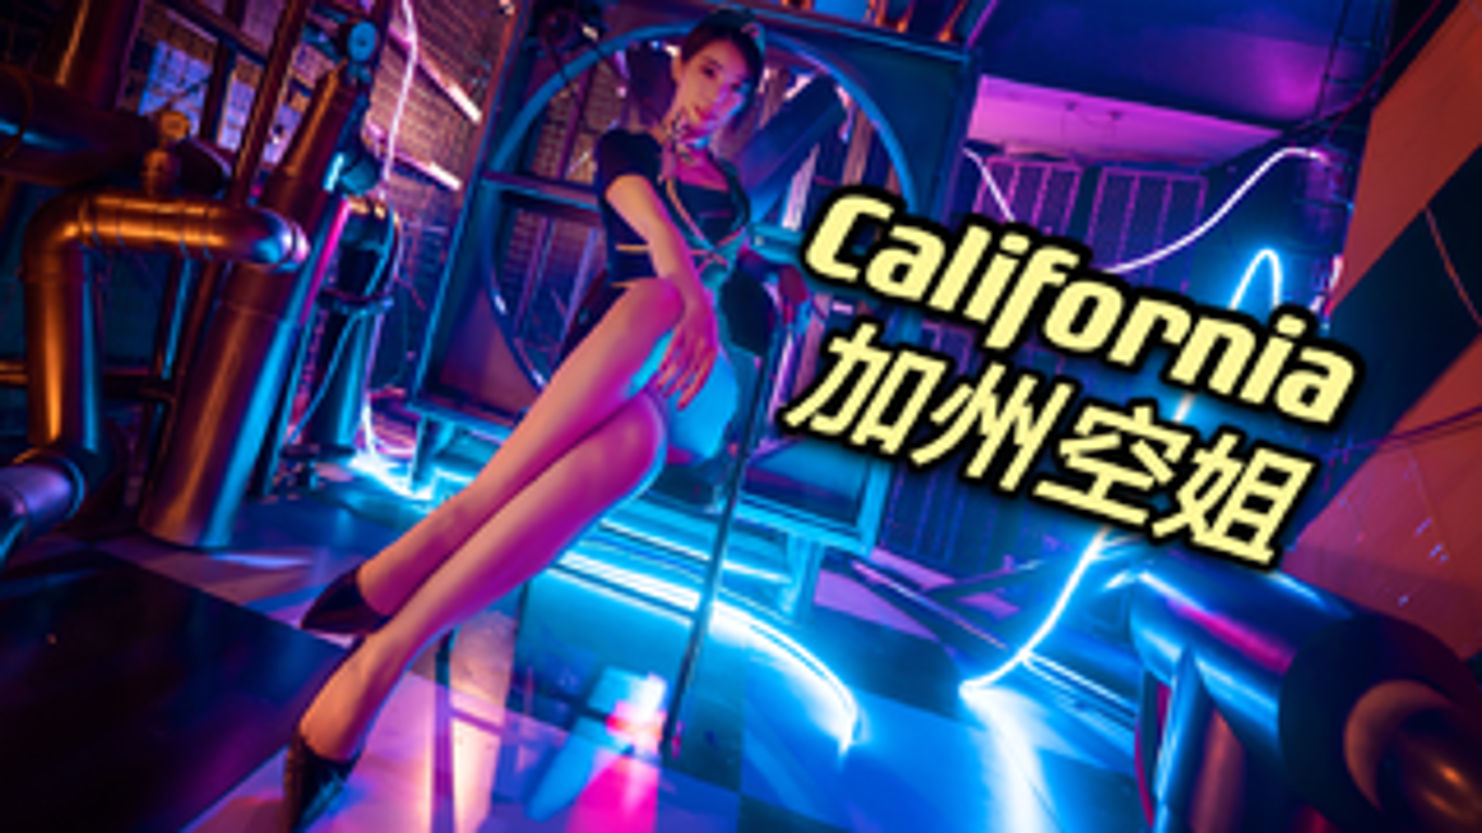 【california加州空姐】致敬经典椅子舞~这样的空姐你爱吗️